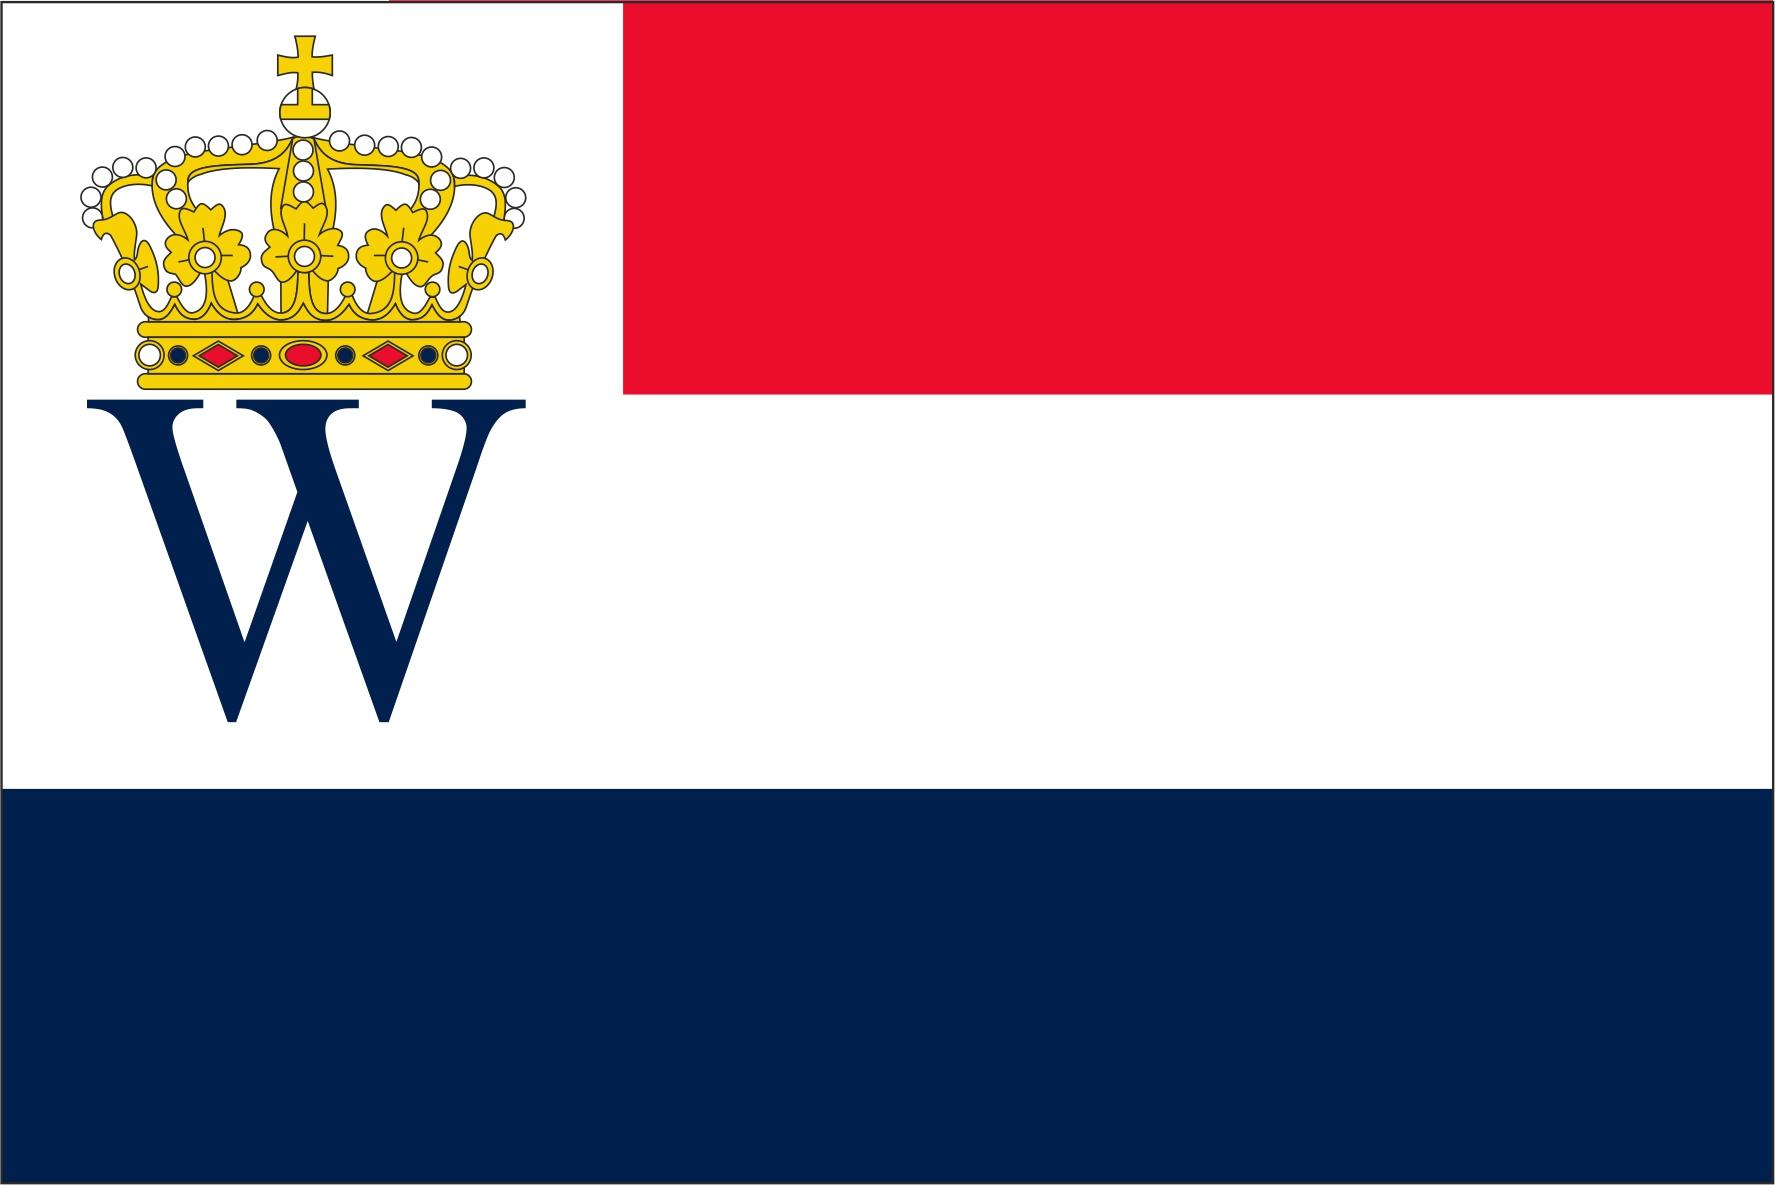 Koninklijke Watersport Vlag 100x150cm Oud hollands Marineblauw